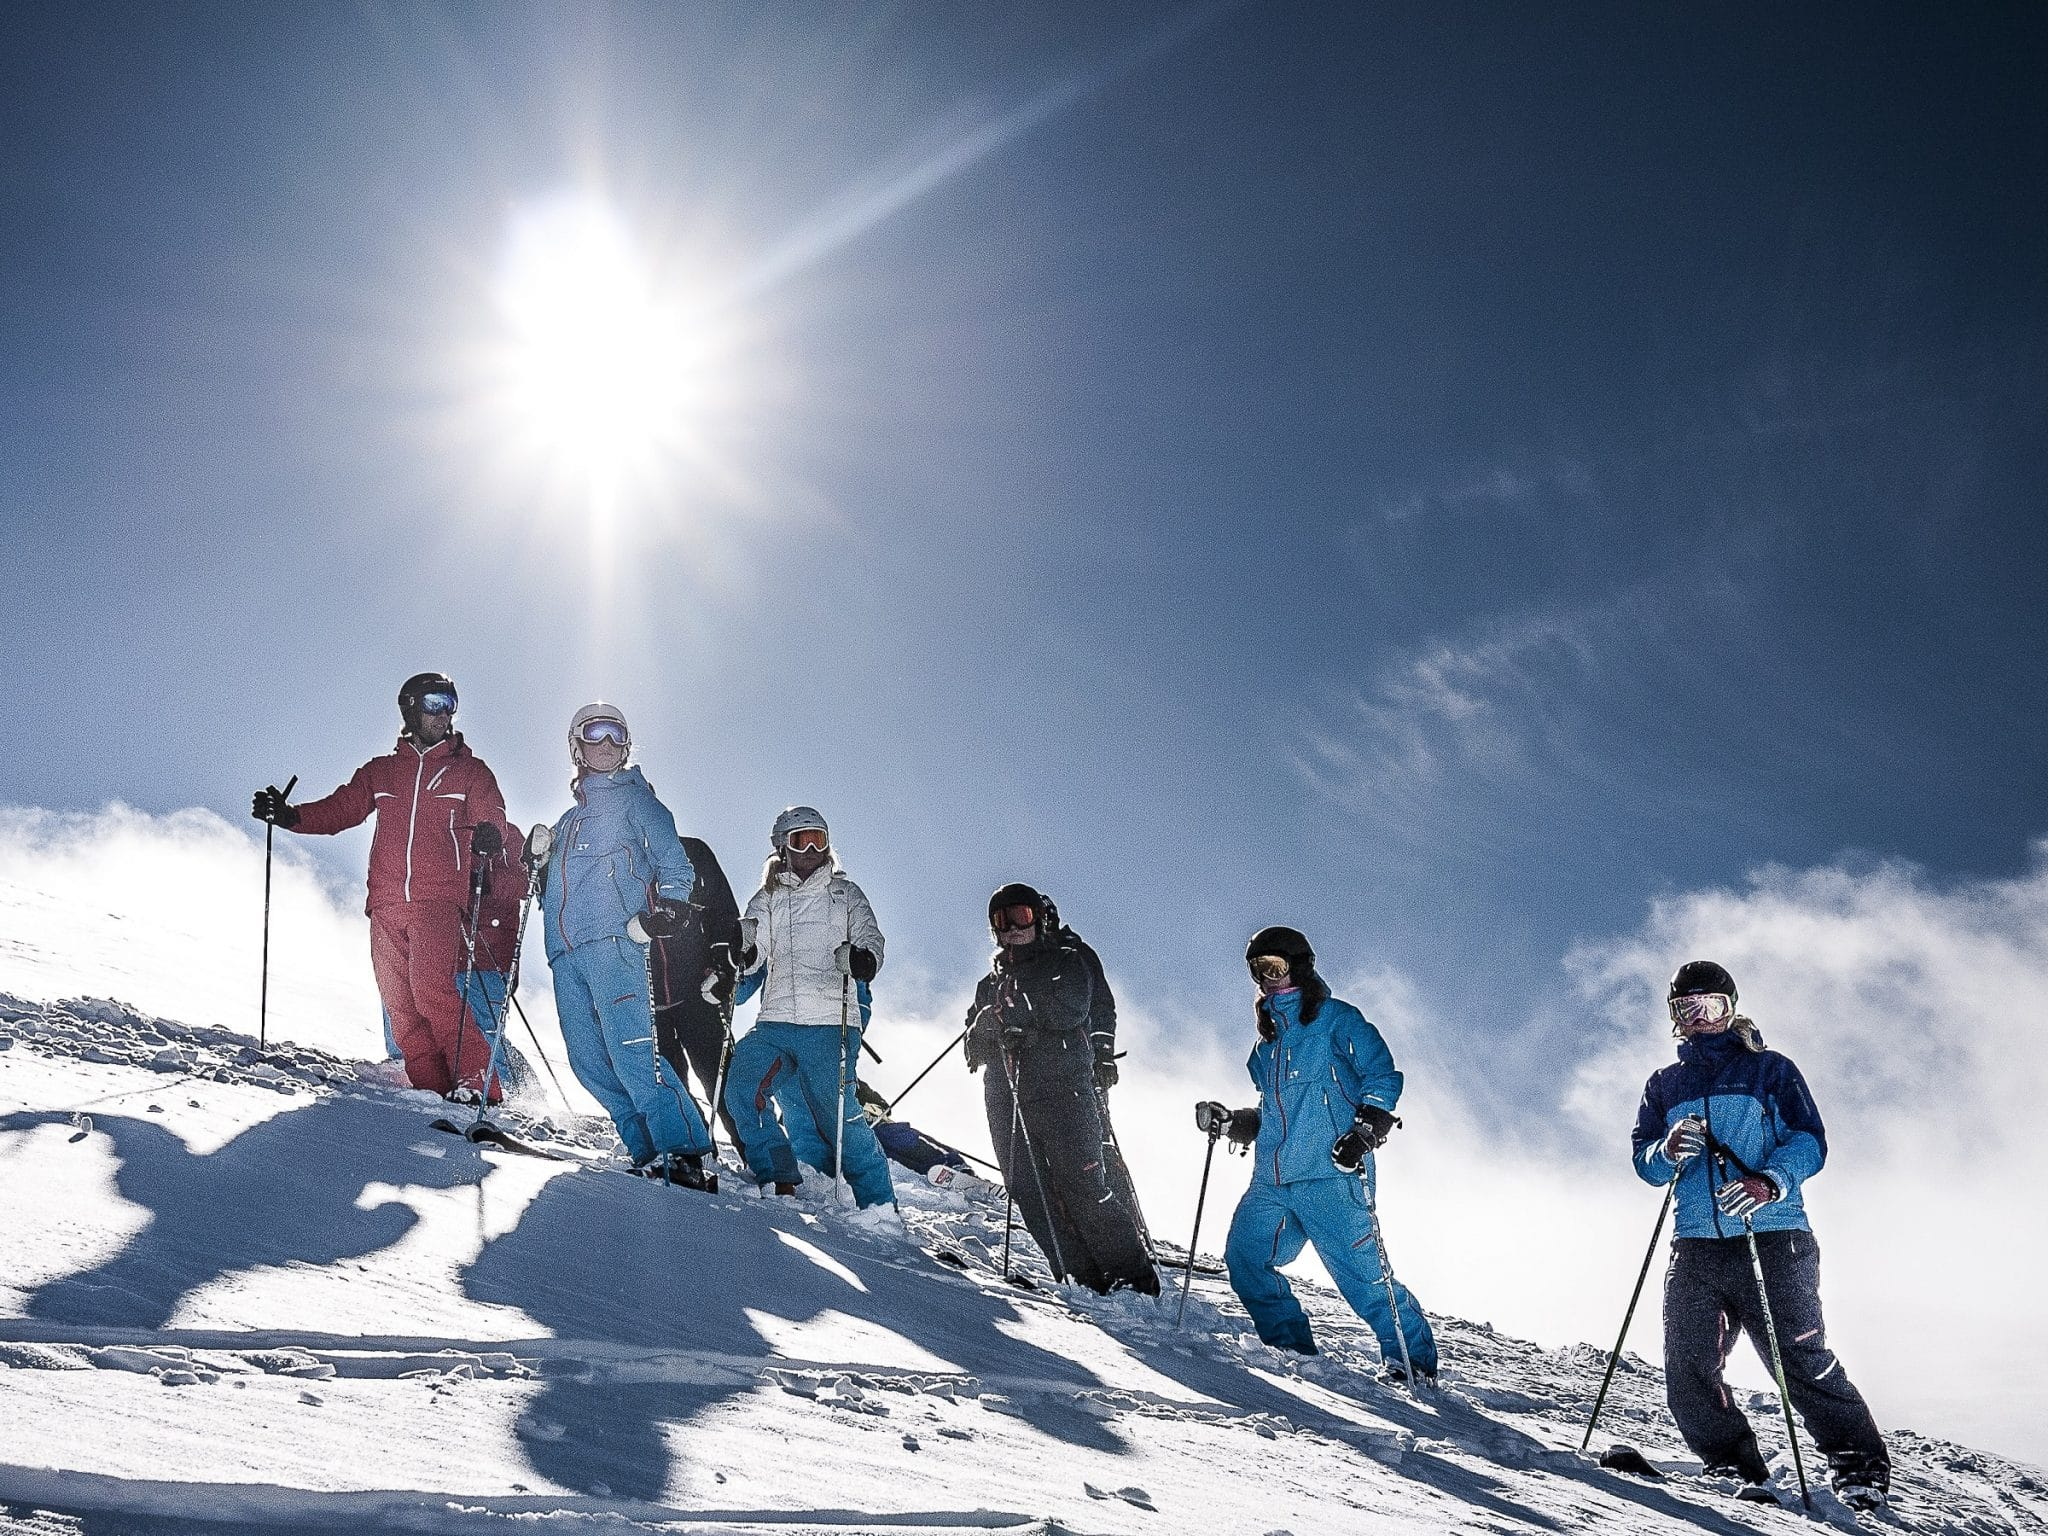 Grupp på skidor en solig dag